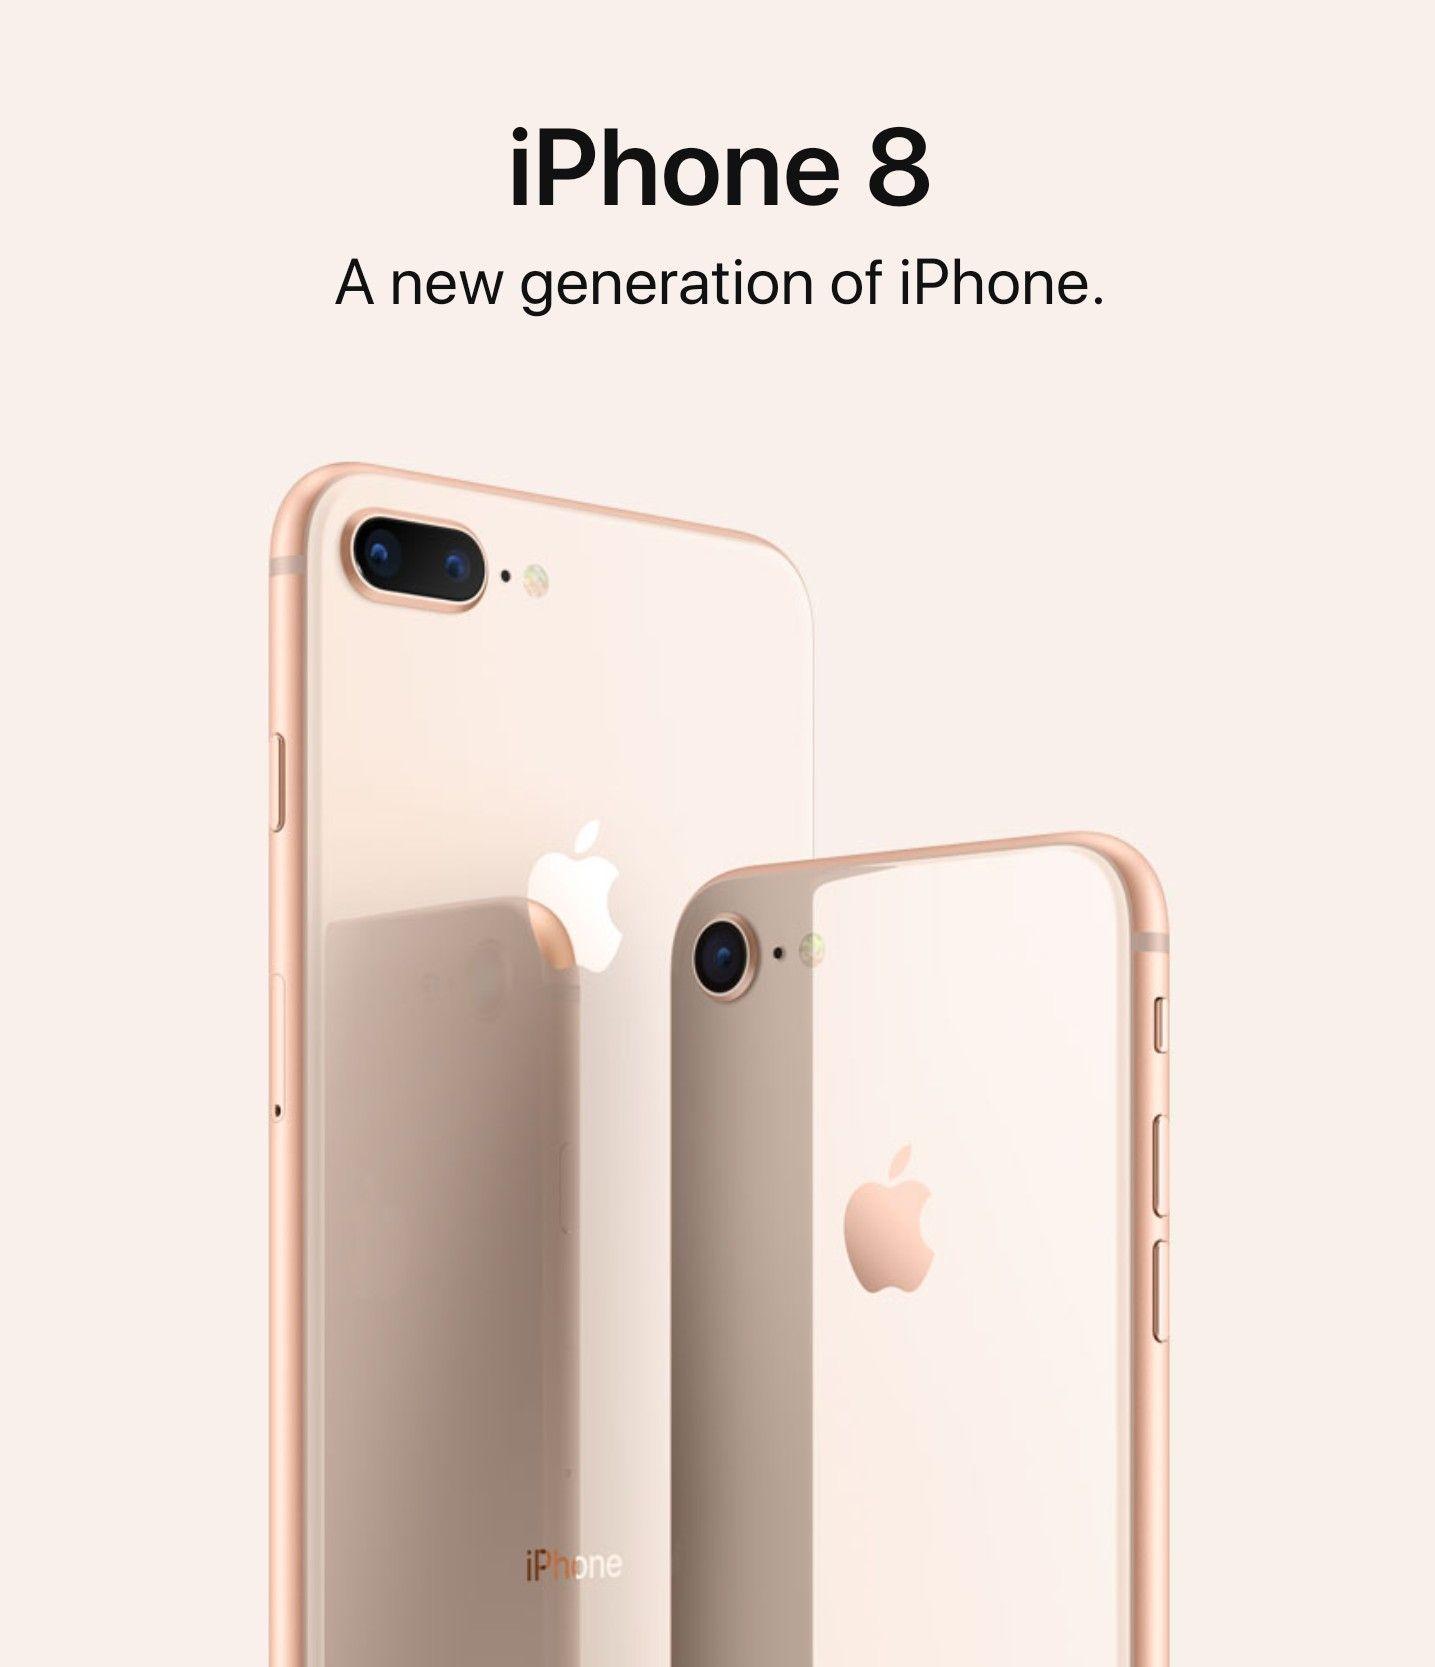 Apple iphone 8 iphone iphone 8 iphone 8 plus